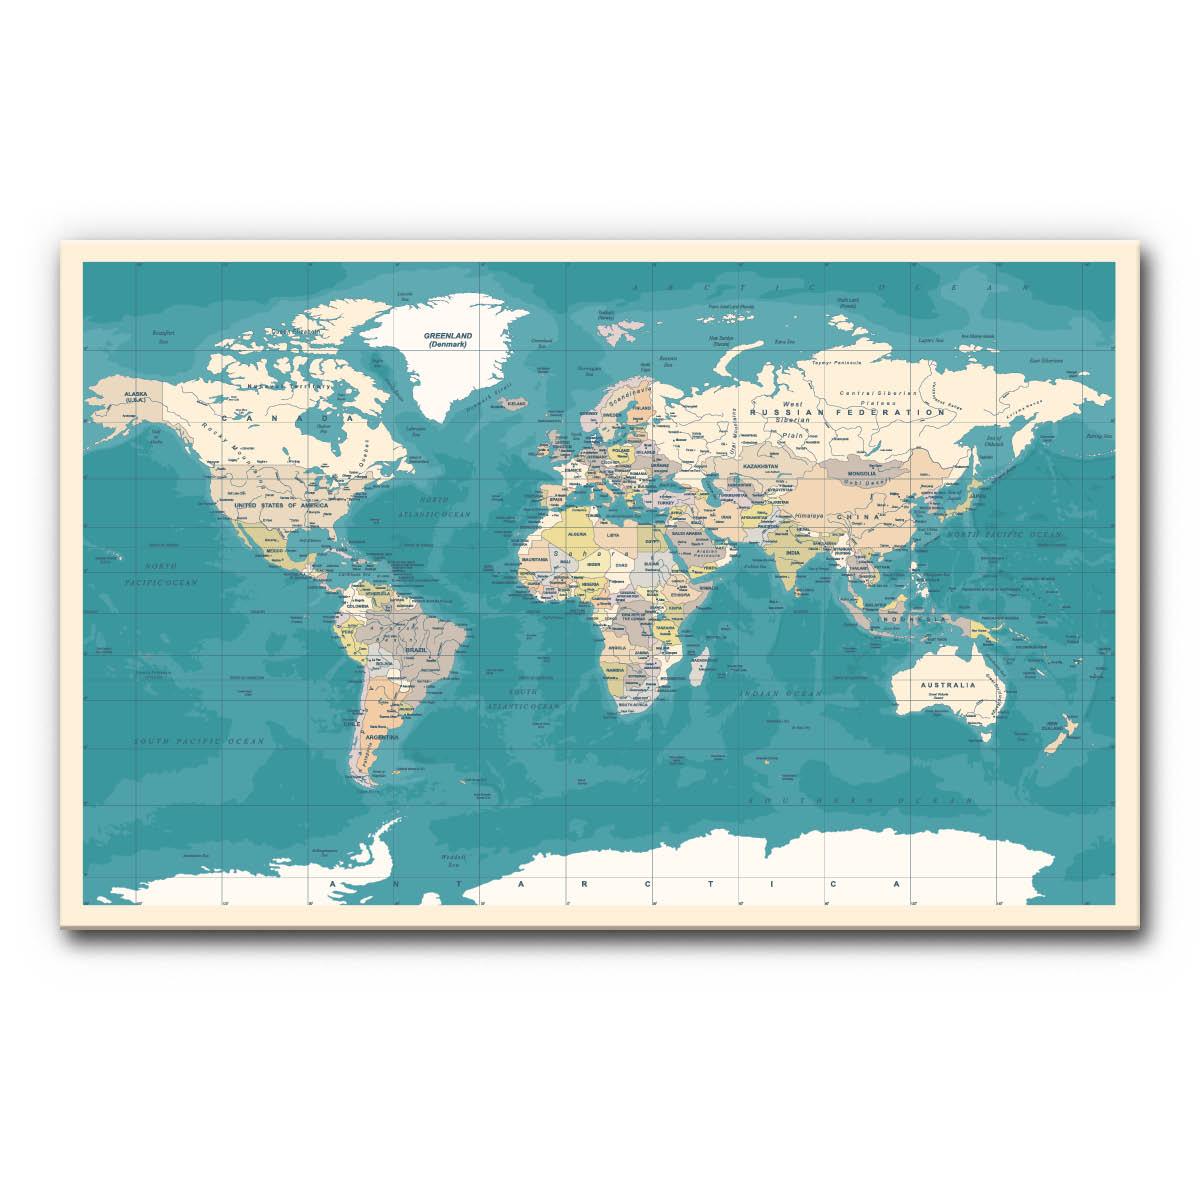 Schallschutzbild (Akustikbild) mit Weltkarte (petrol)